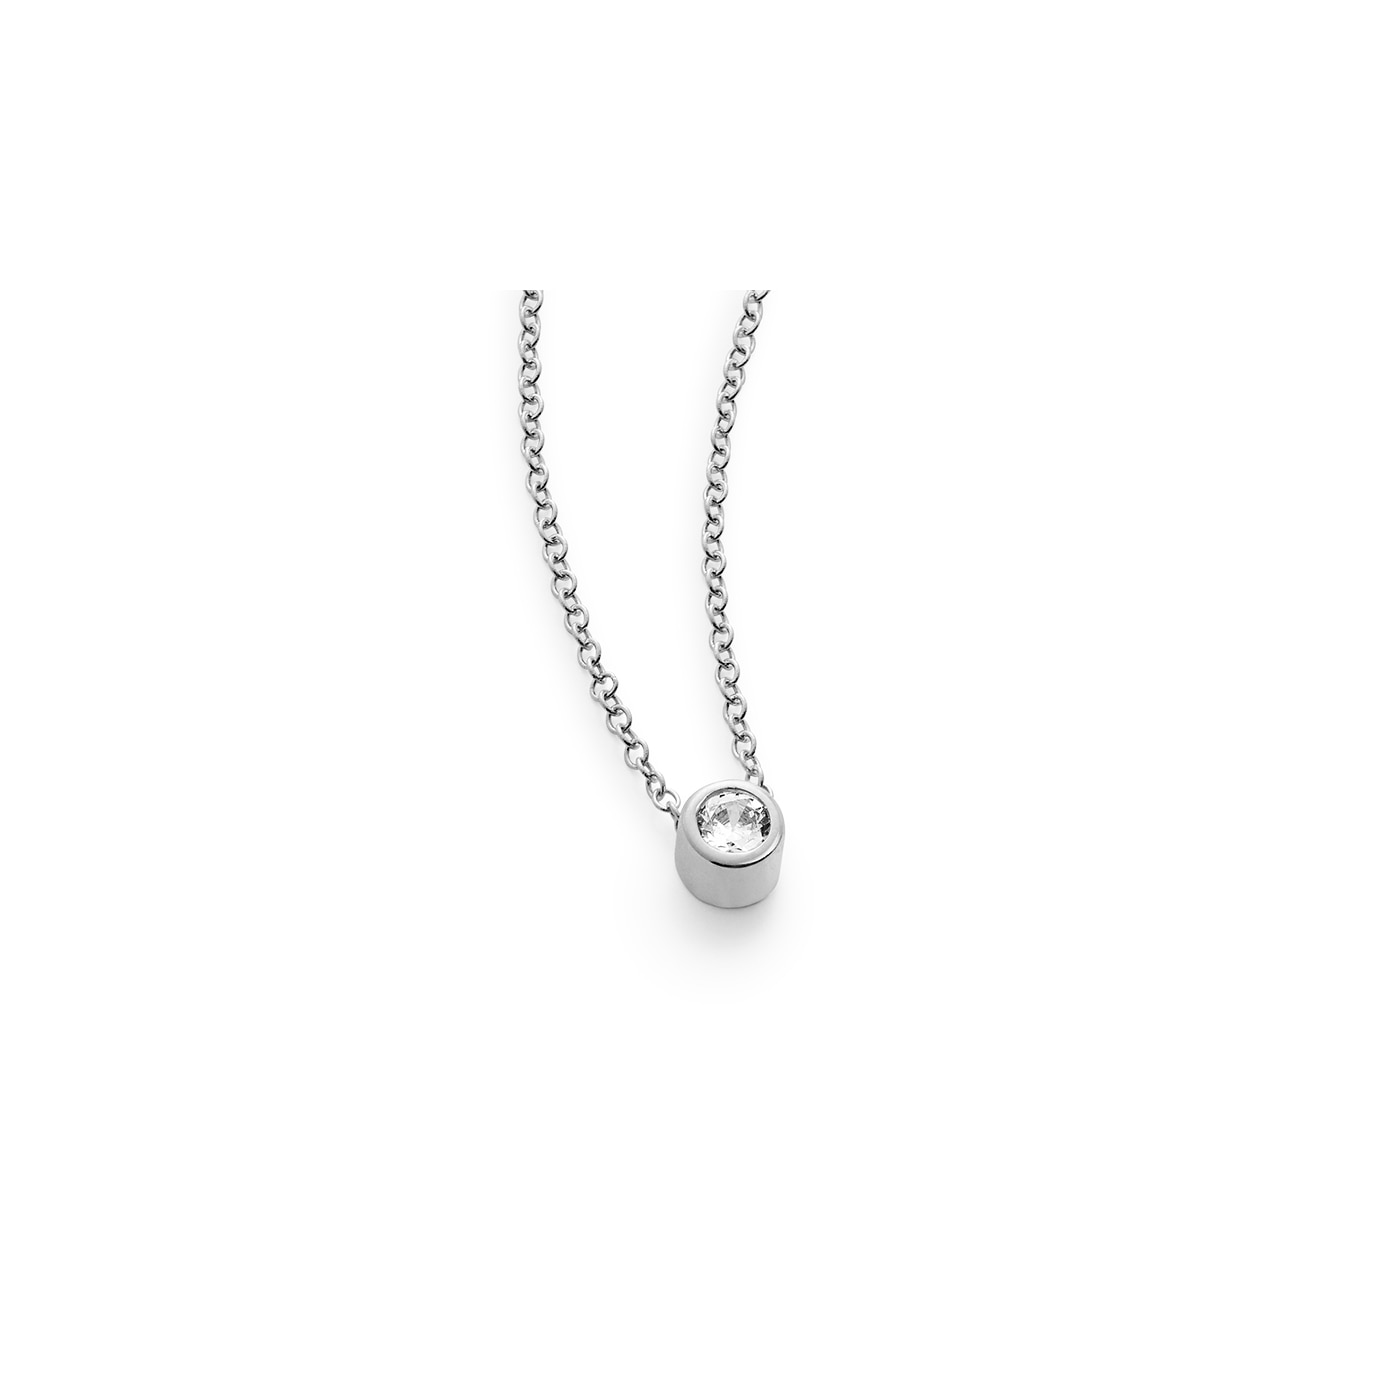 Gloria halsband 18K 0,14 ct 42-45 cm